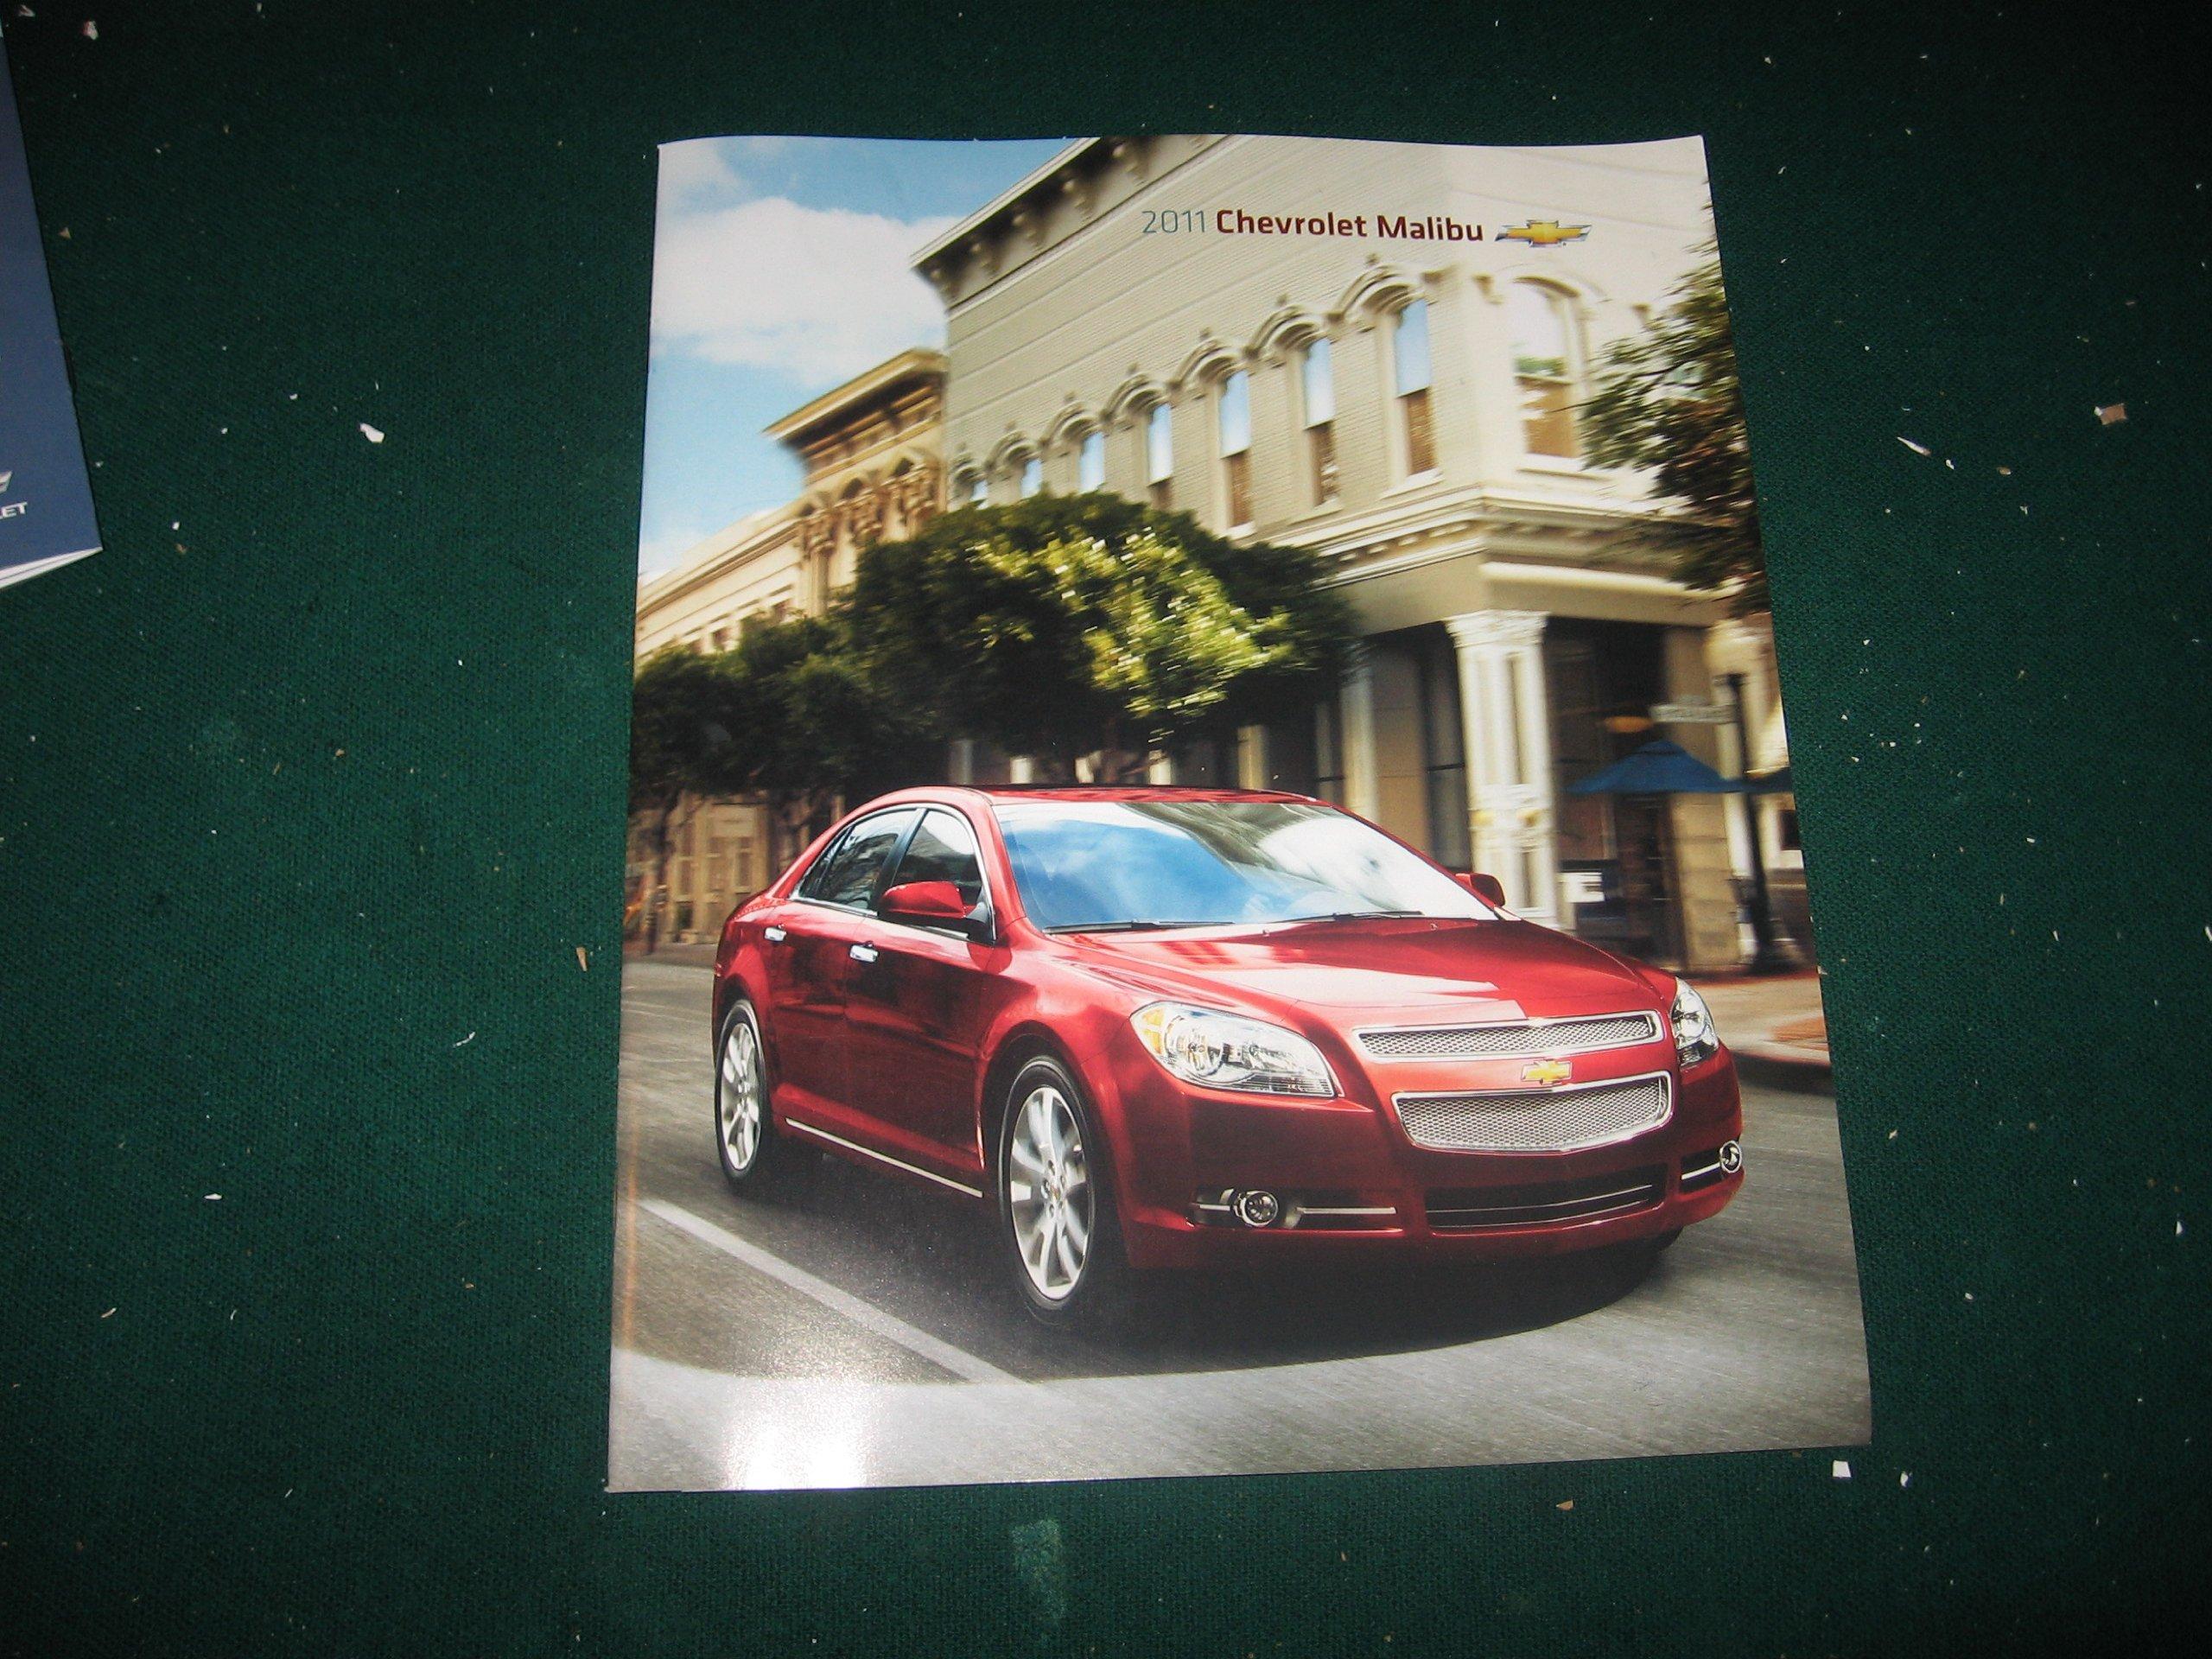 2011 Chevy Malibu For Sale >> 2011 Chevy Malibu Sales Brochure Ls Lt Ltz Chevrolet